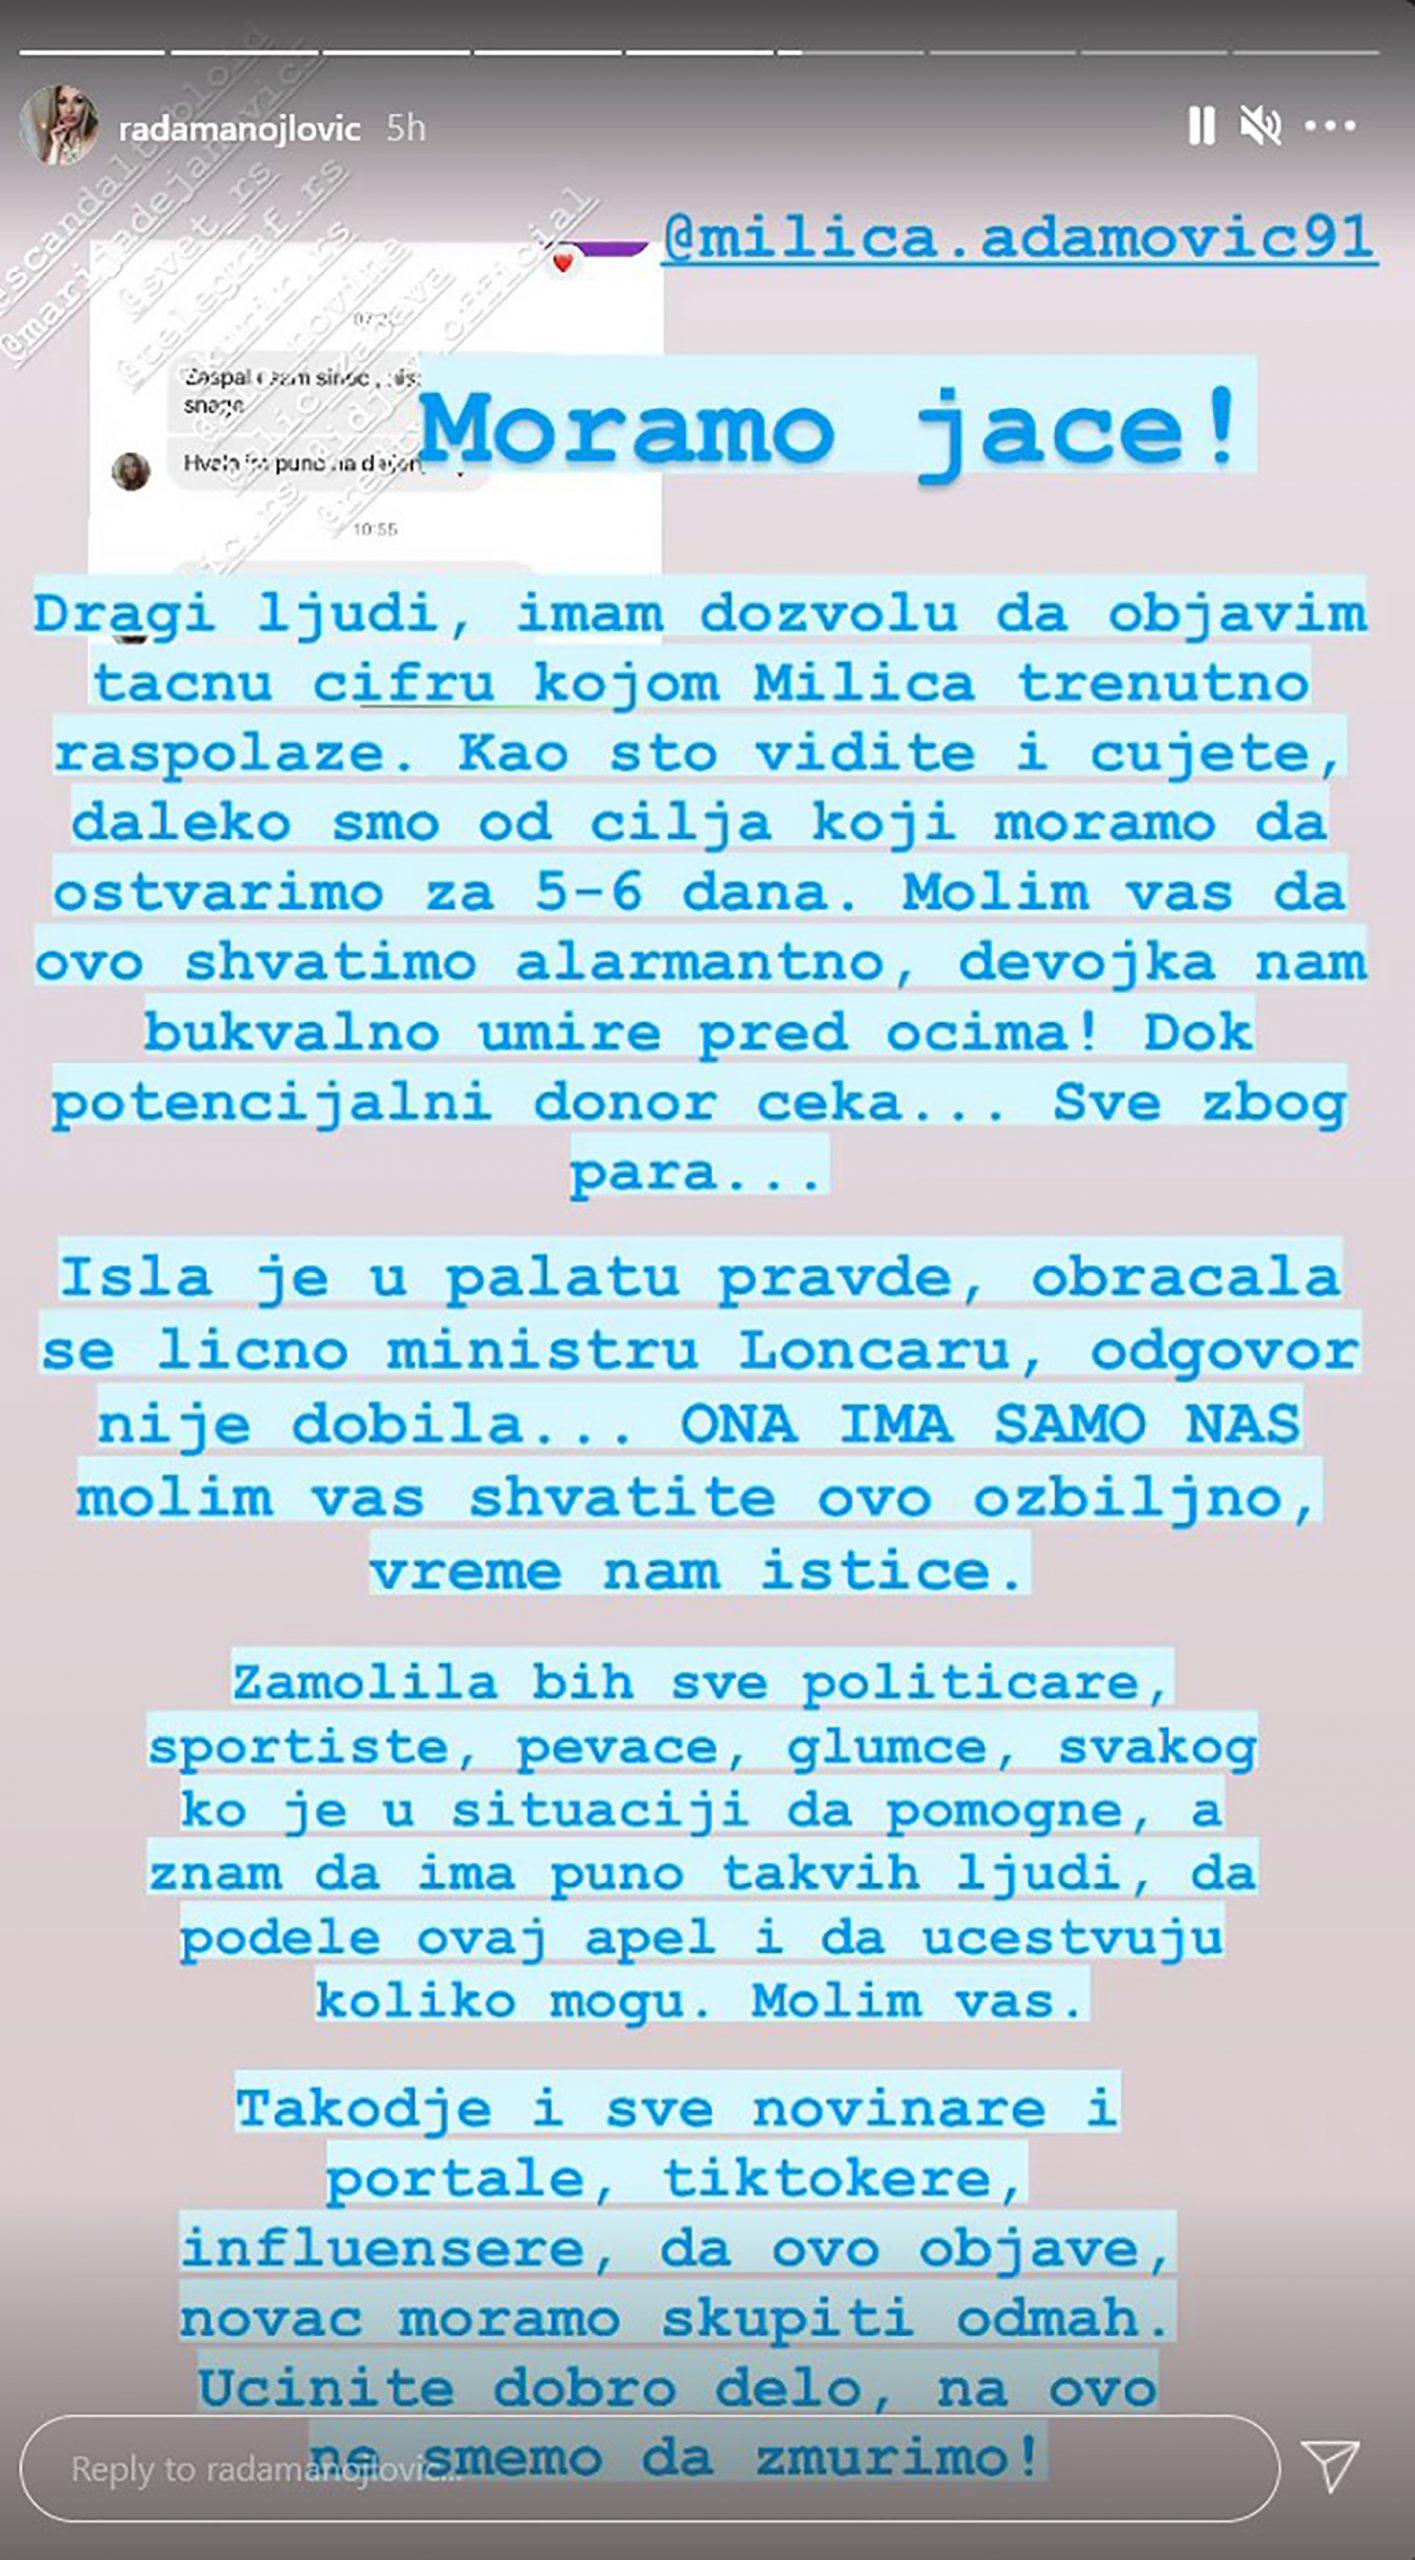 Radmila Rada Manojlovic apel za pomoc Milici Adamovic